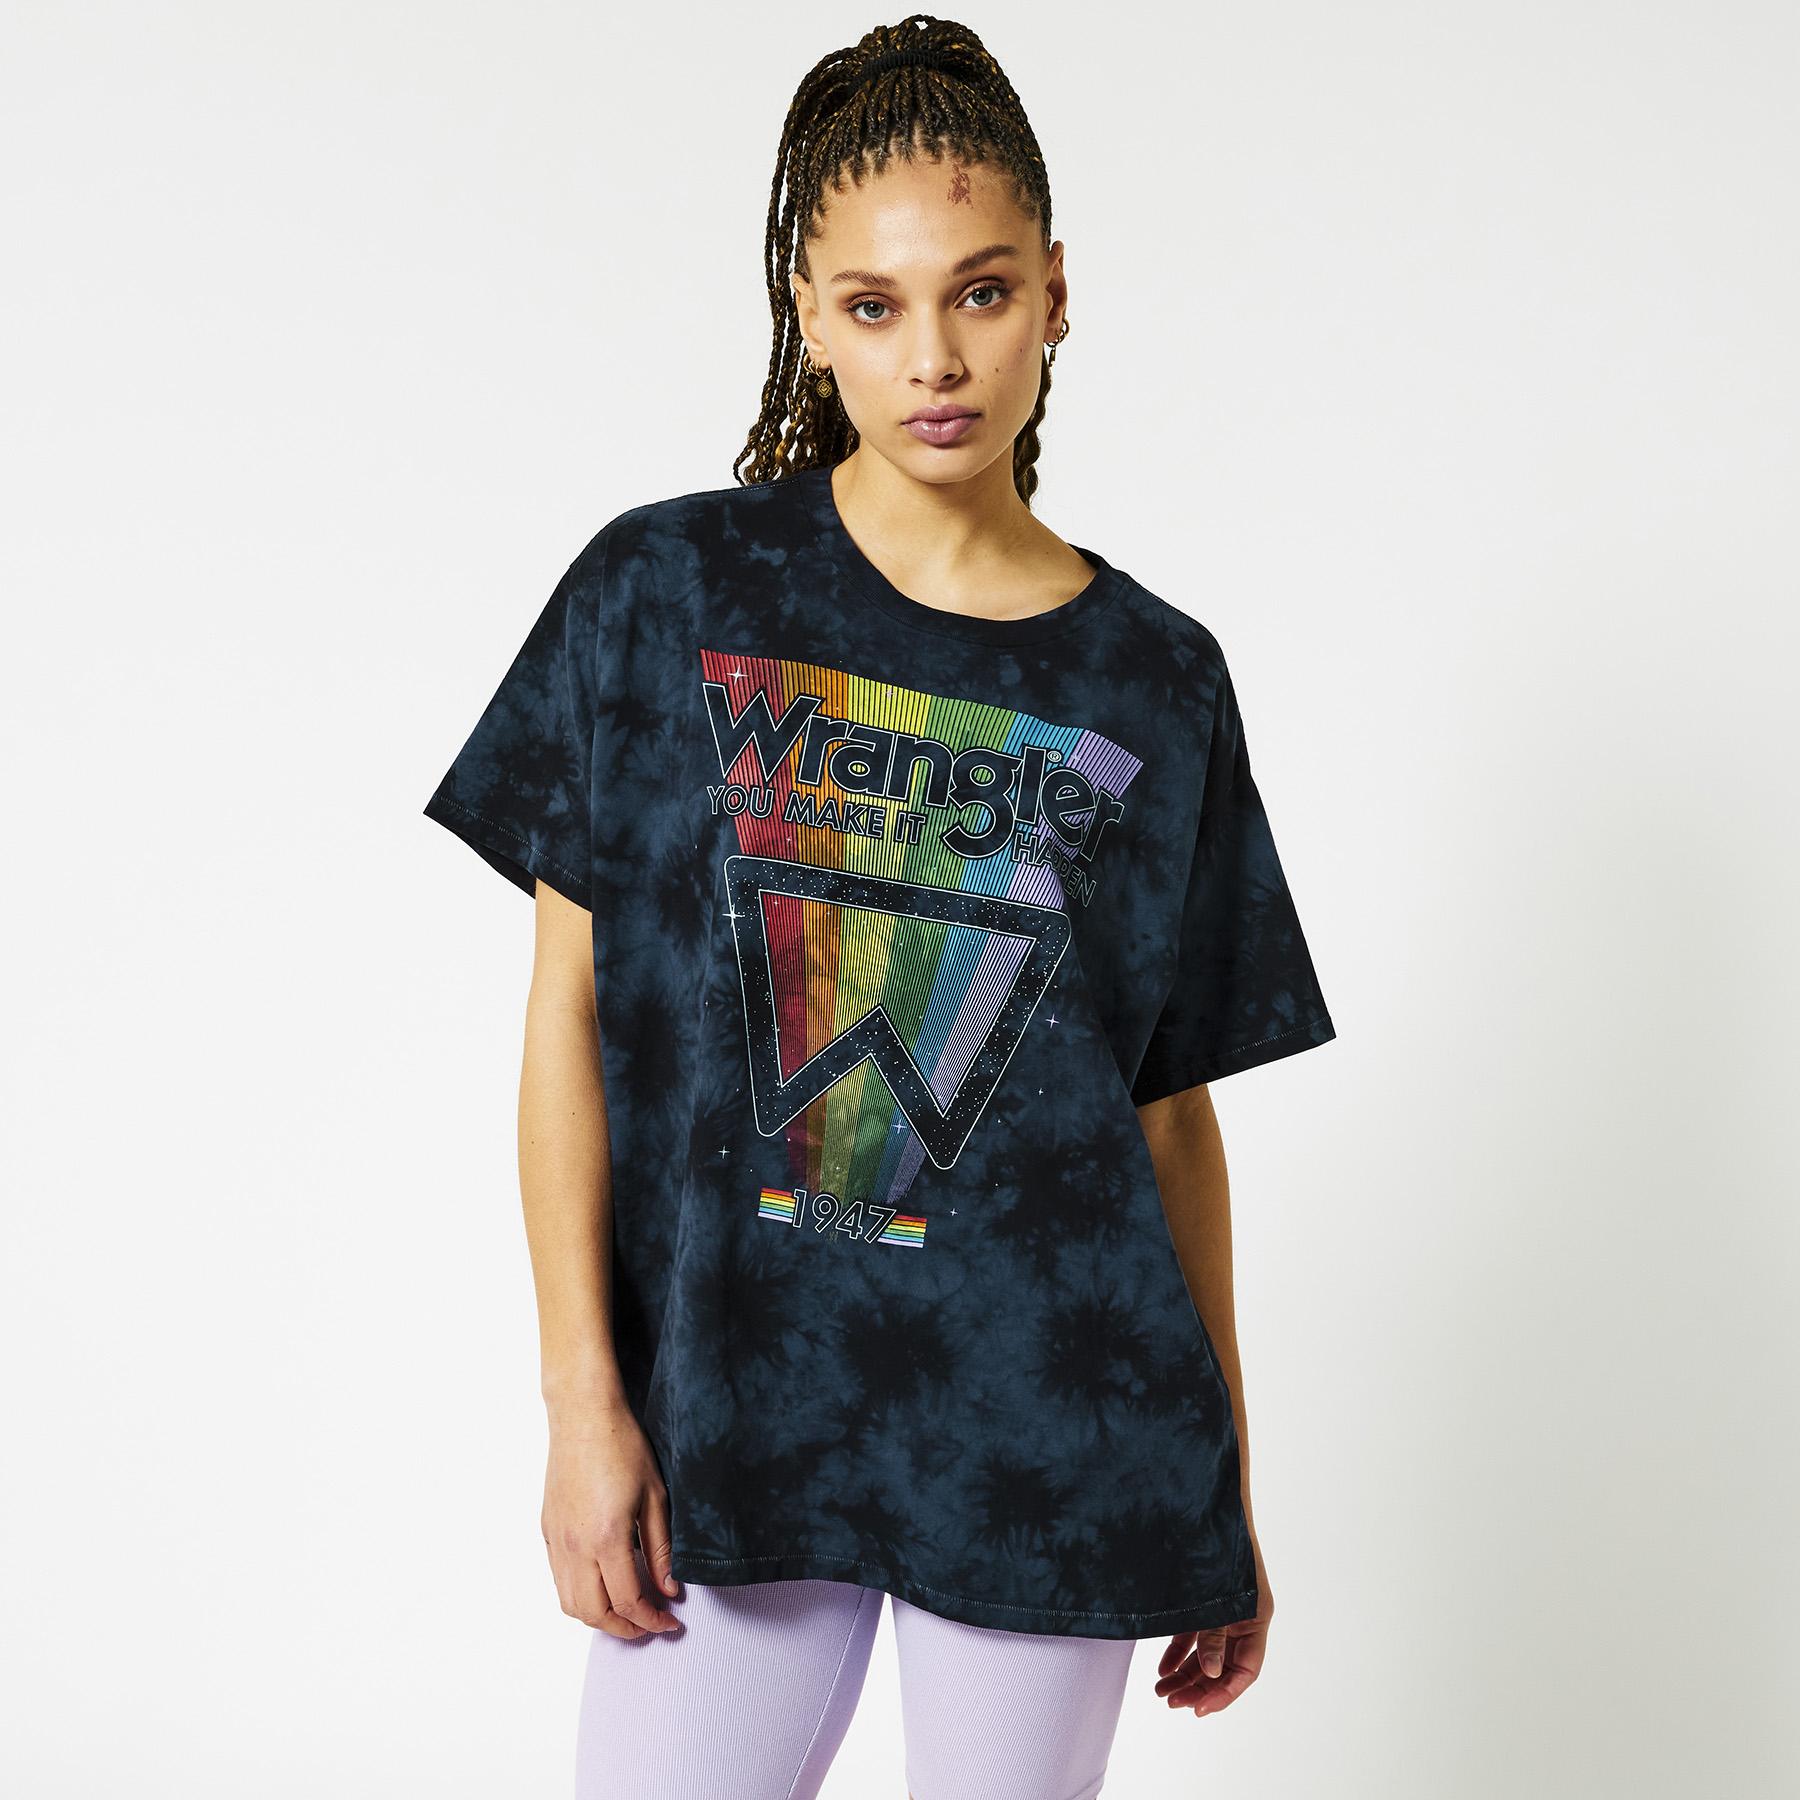 T-shirt Oversized tee